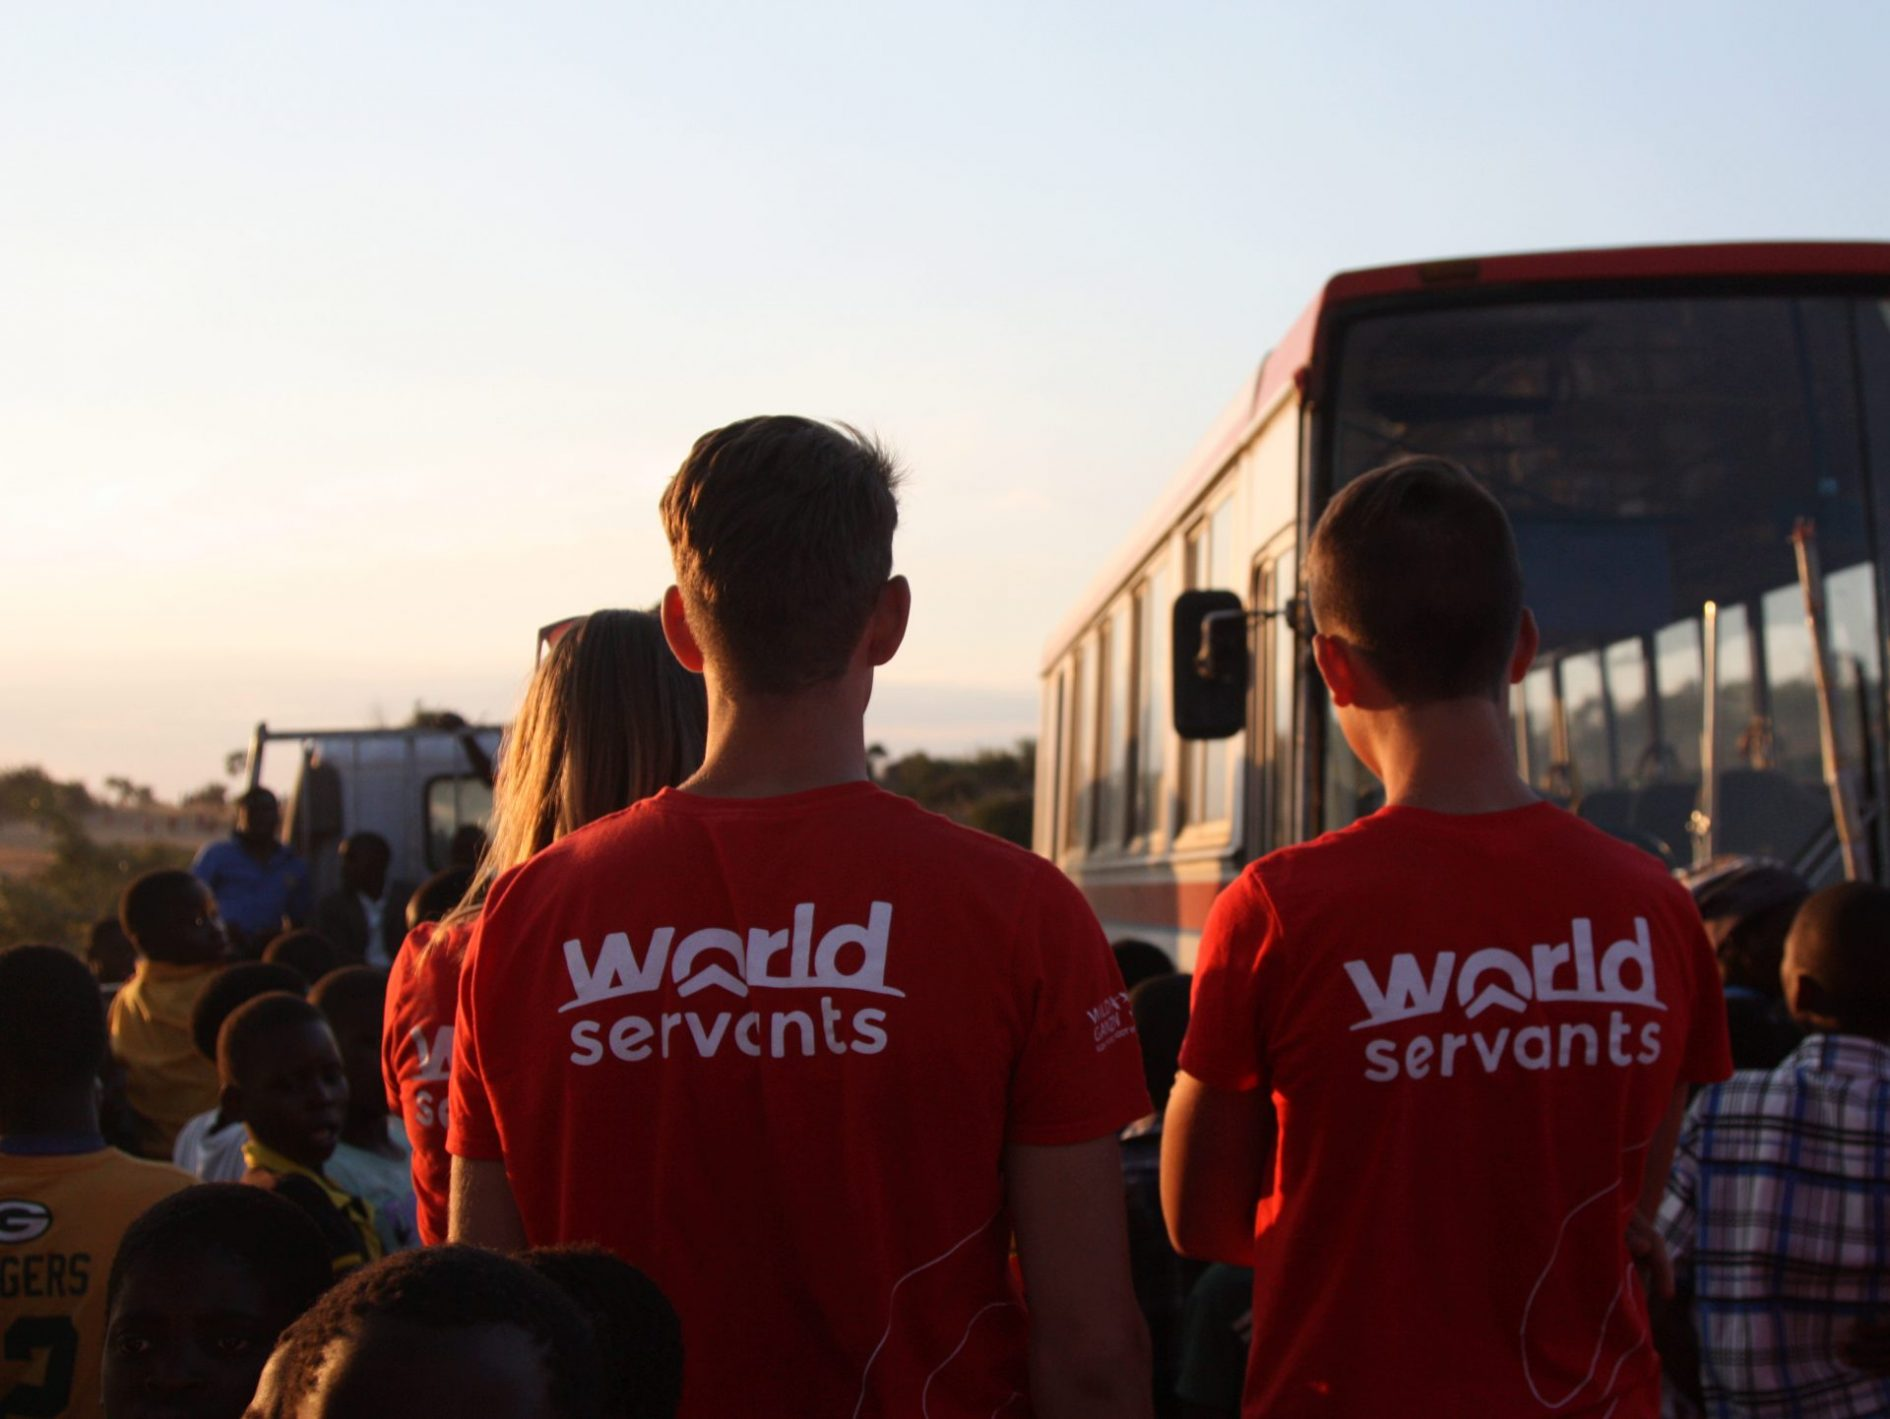 De World Servants op pad…